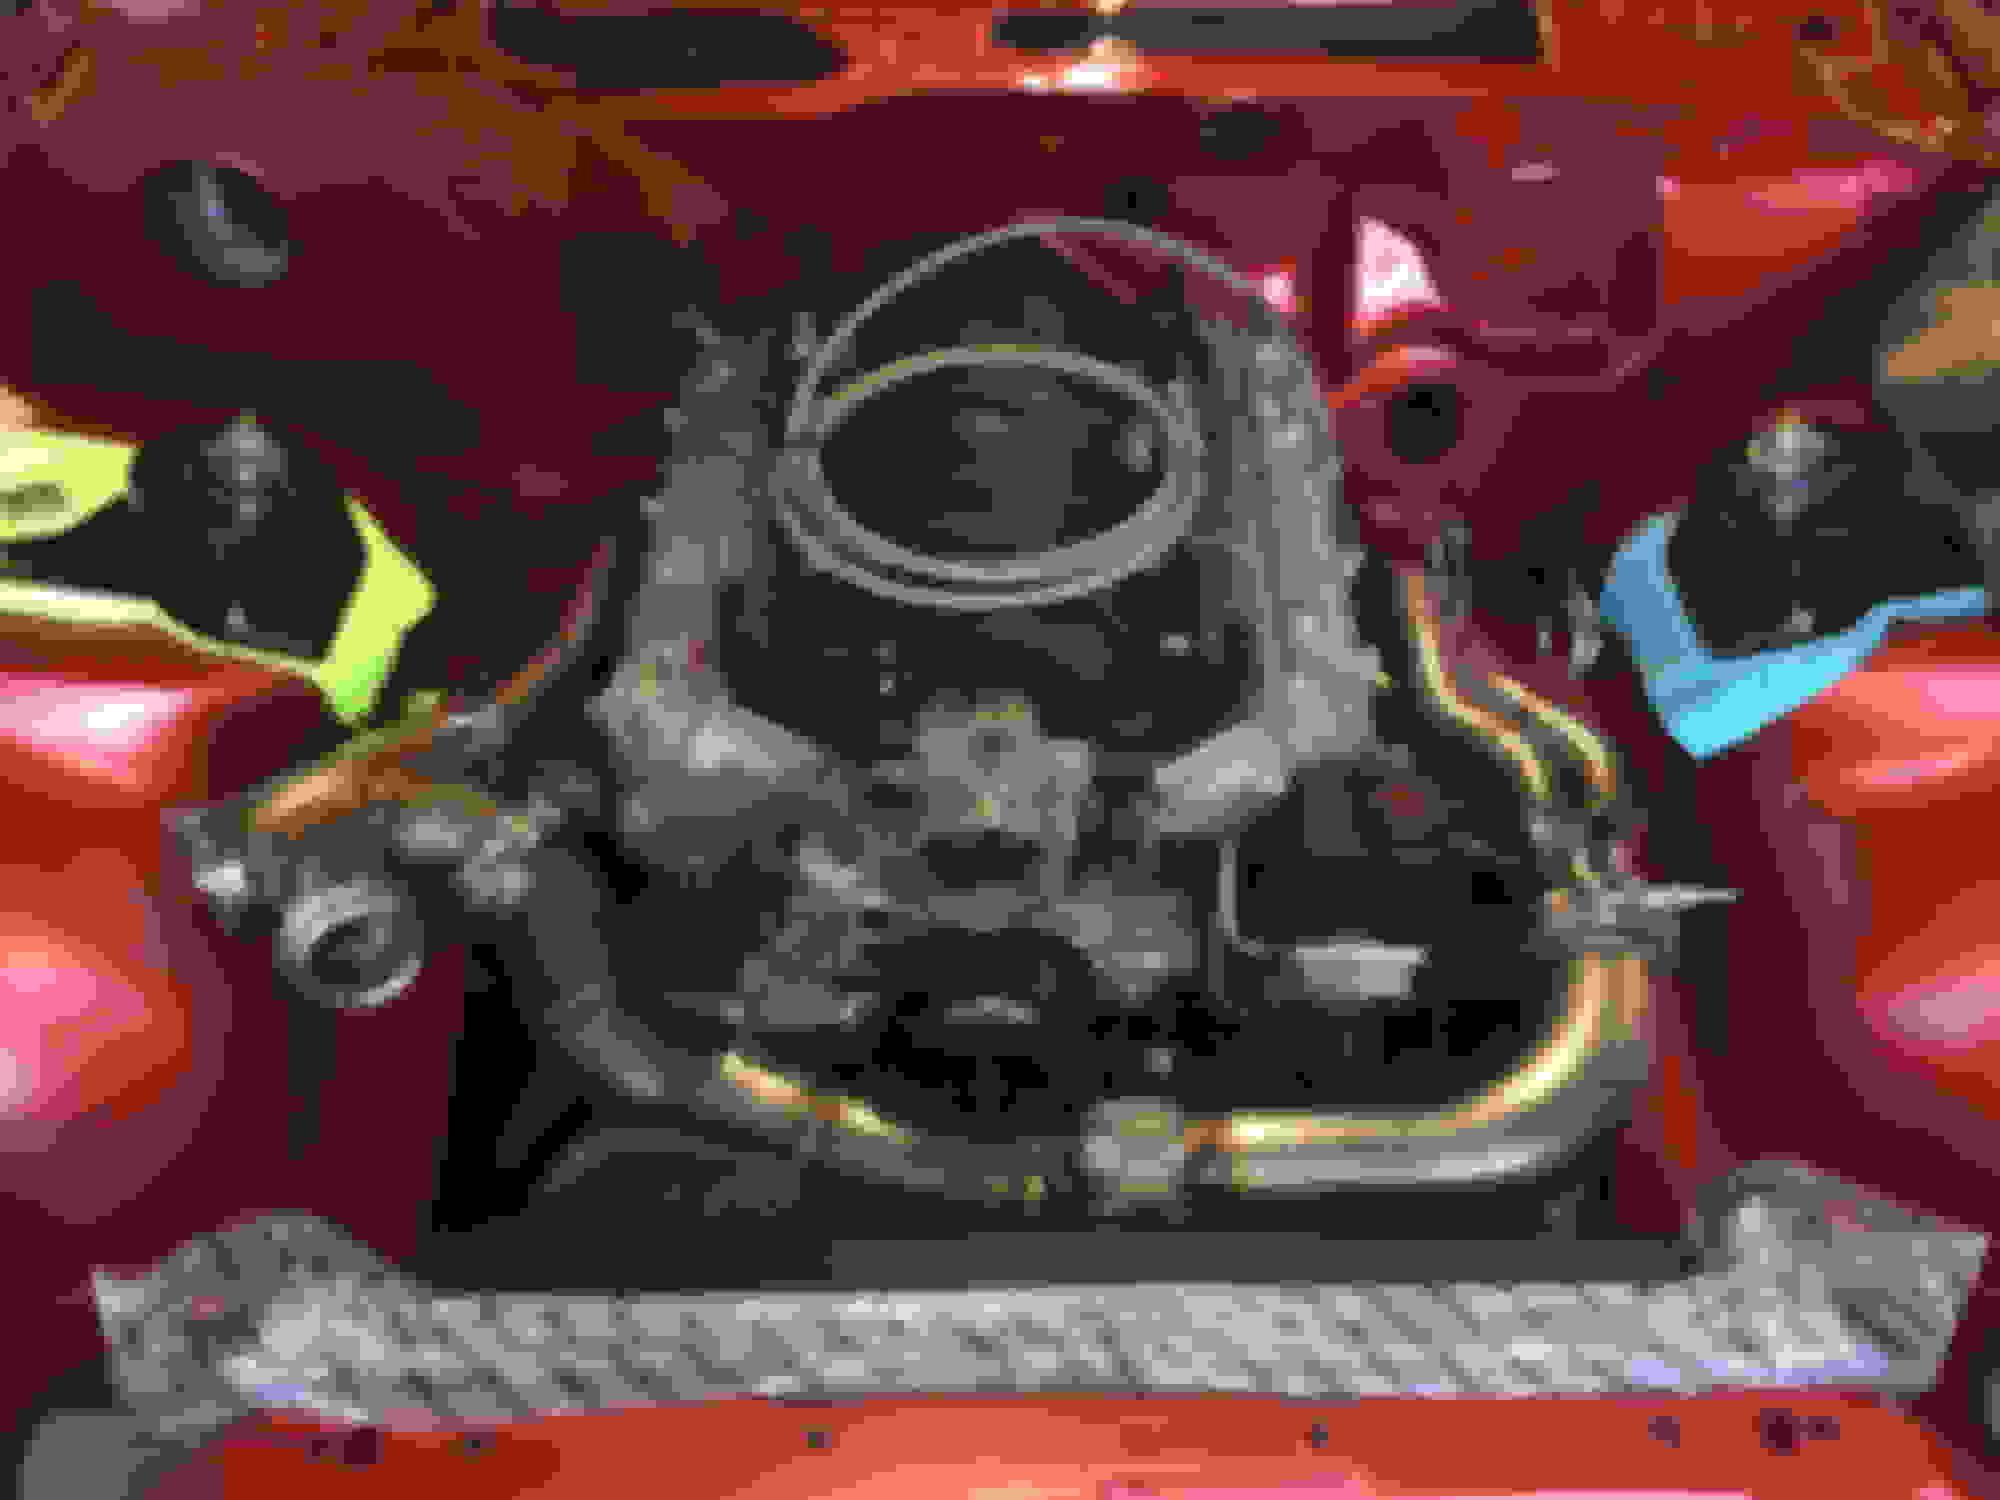 Installation of CXRacing's LS based third-gen turbo kit